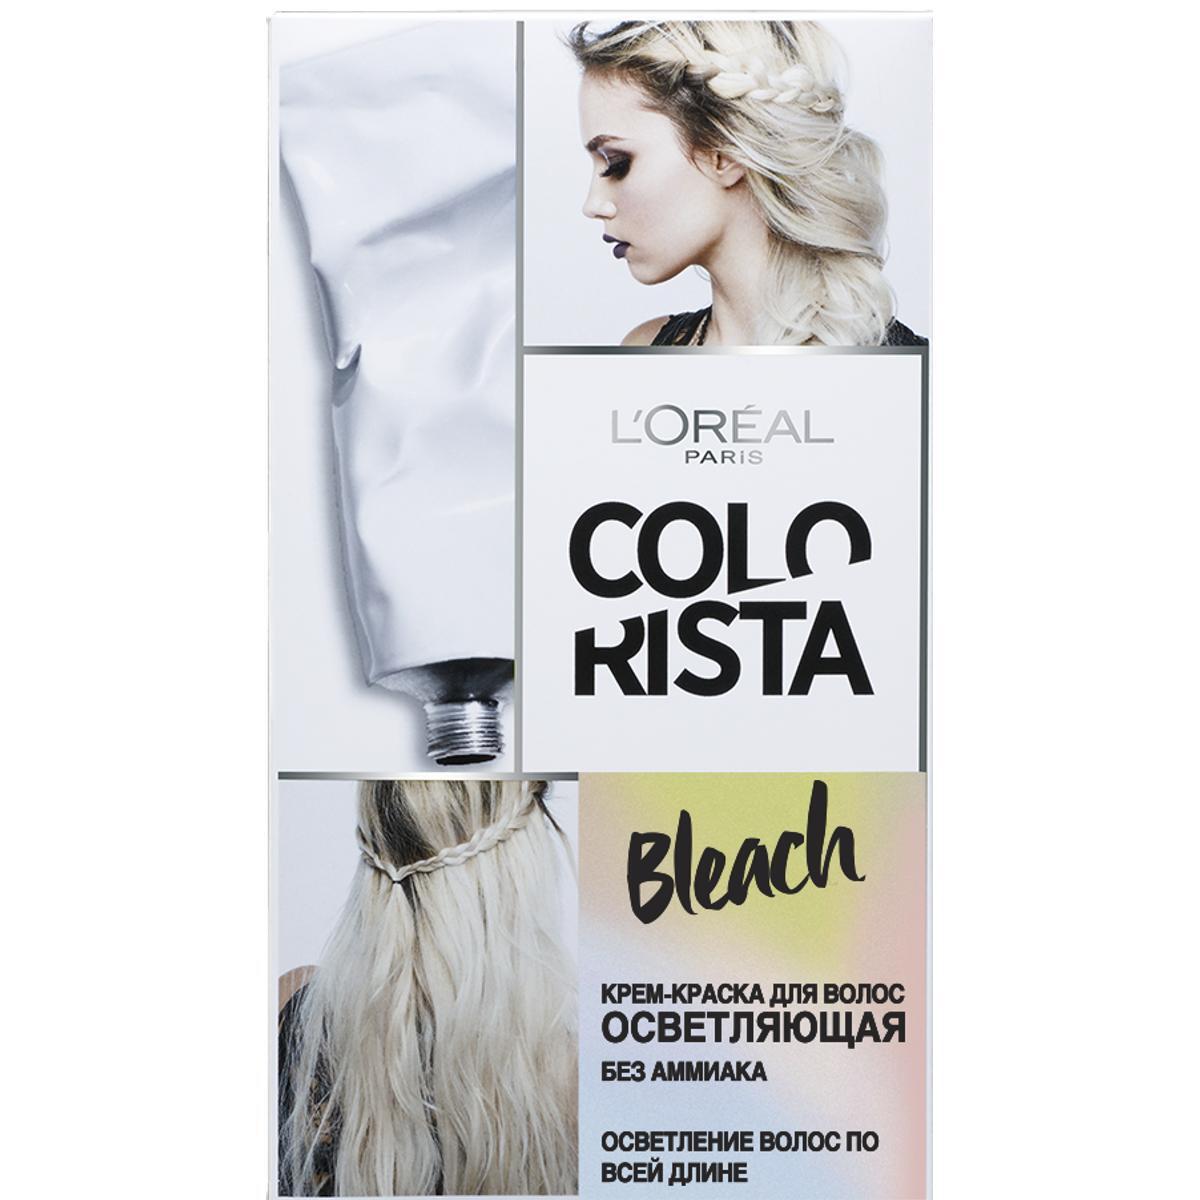 "L'Oreal Paris Крем-краска для волос осветляющая ""Colorista Bleach"", без аммиака  #1"